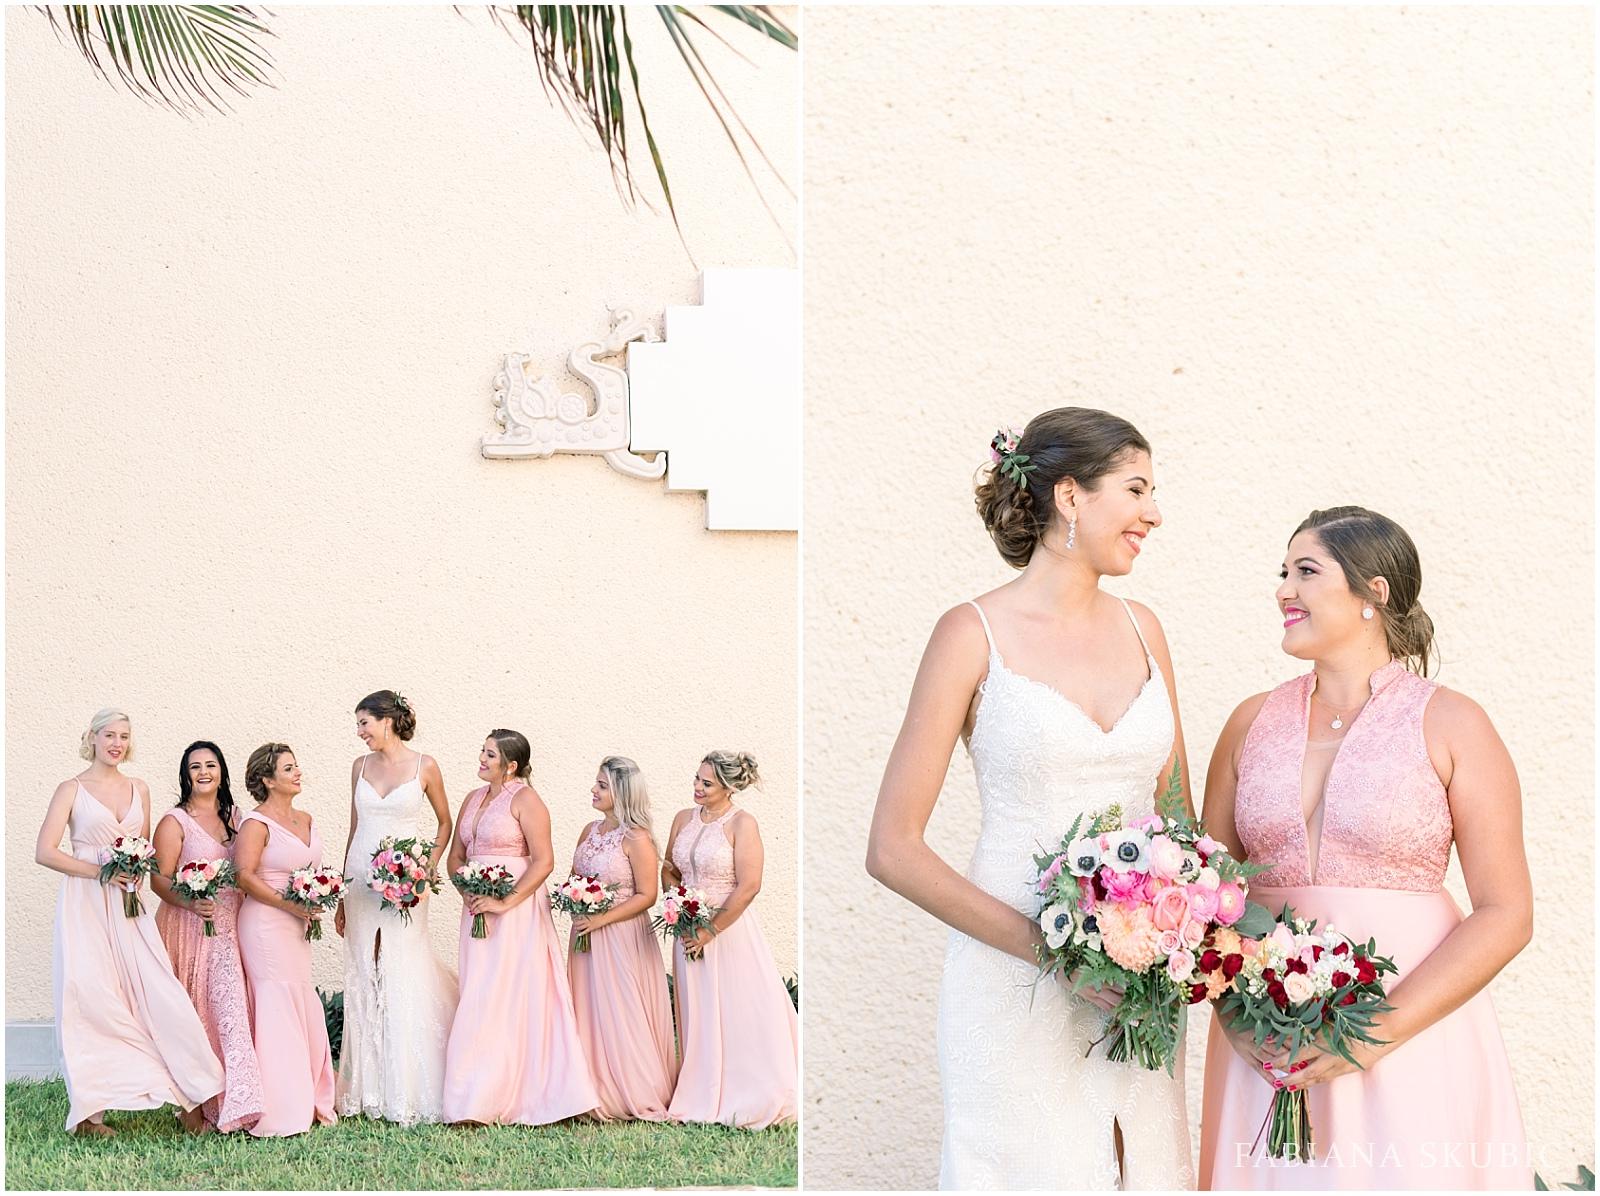 TJ_Now_Sapphire_Riviera_Cancun_Mexico_Wedding_Photos_0214.jpg